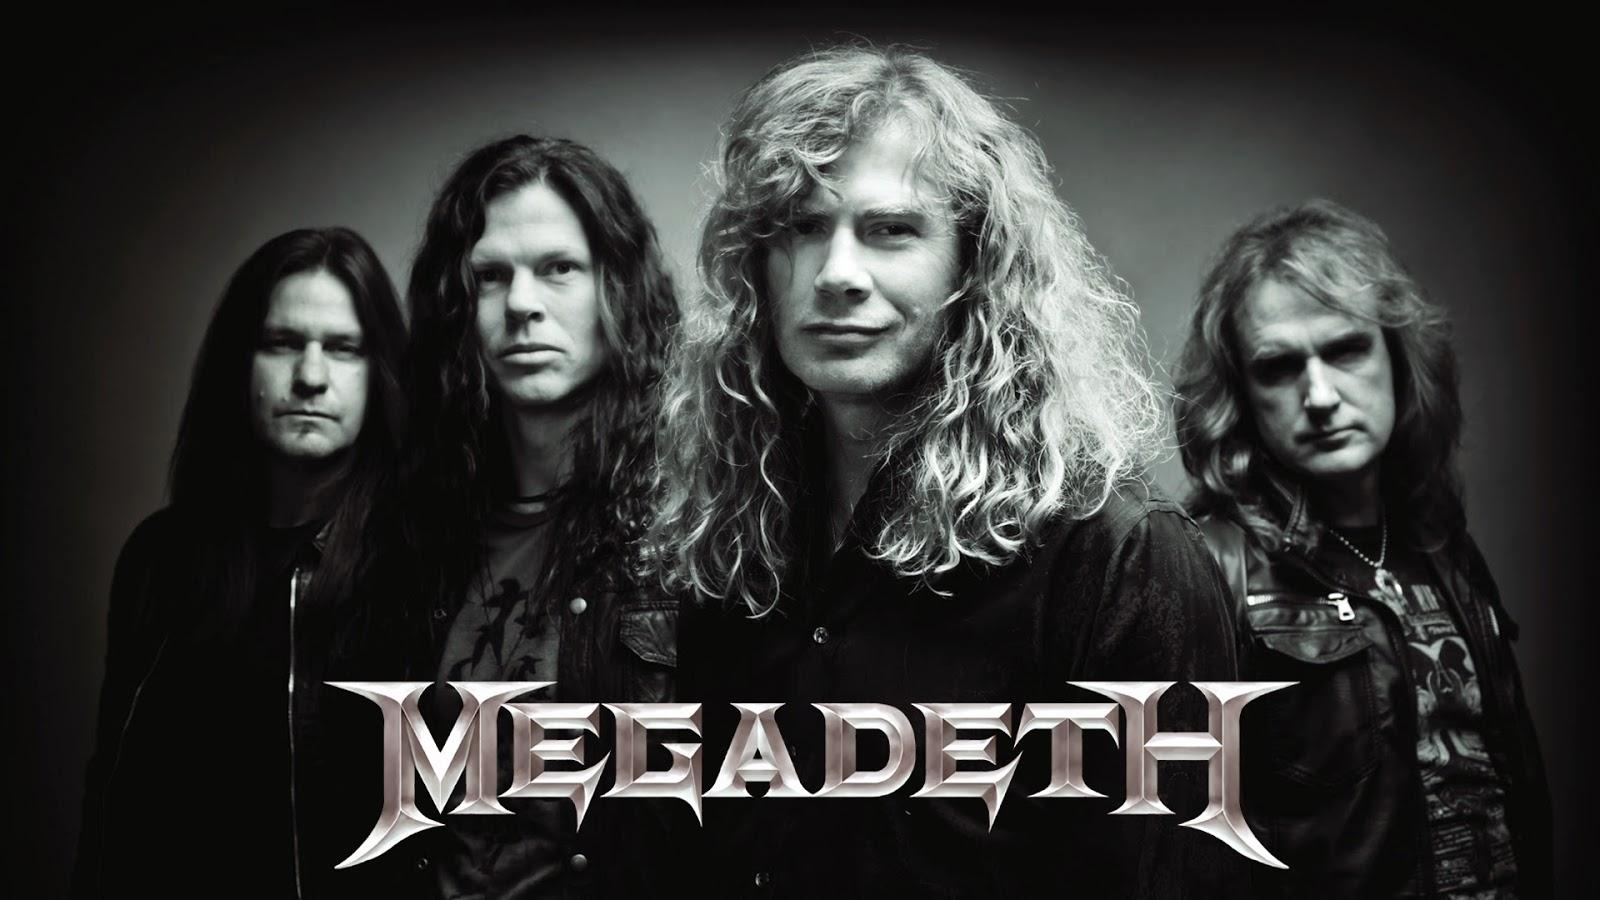 ¿Metallica o Megadeth?. 179847